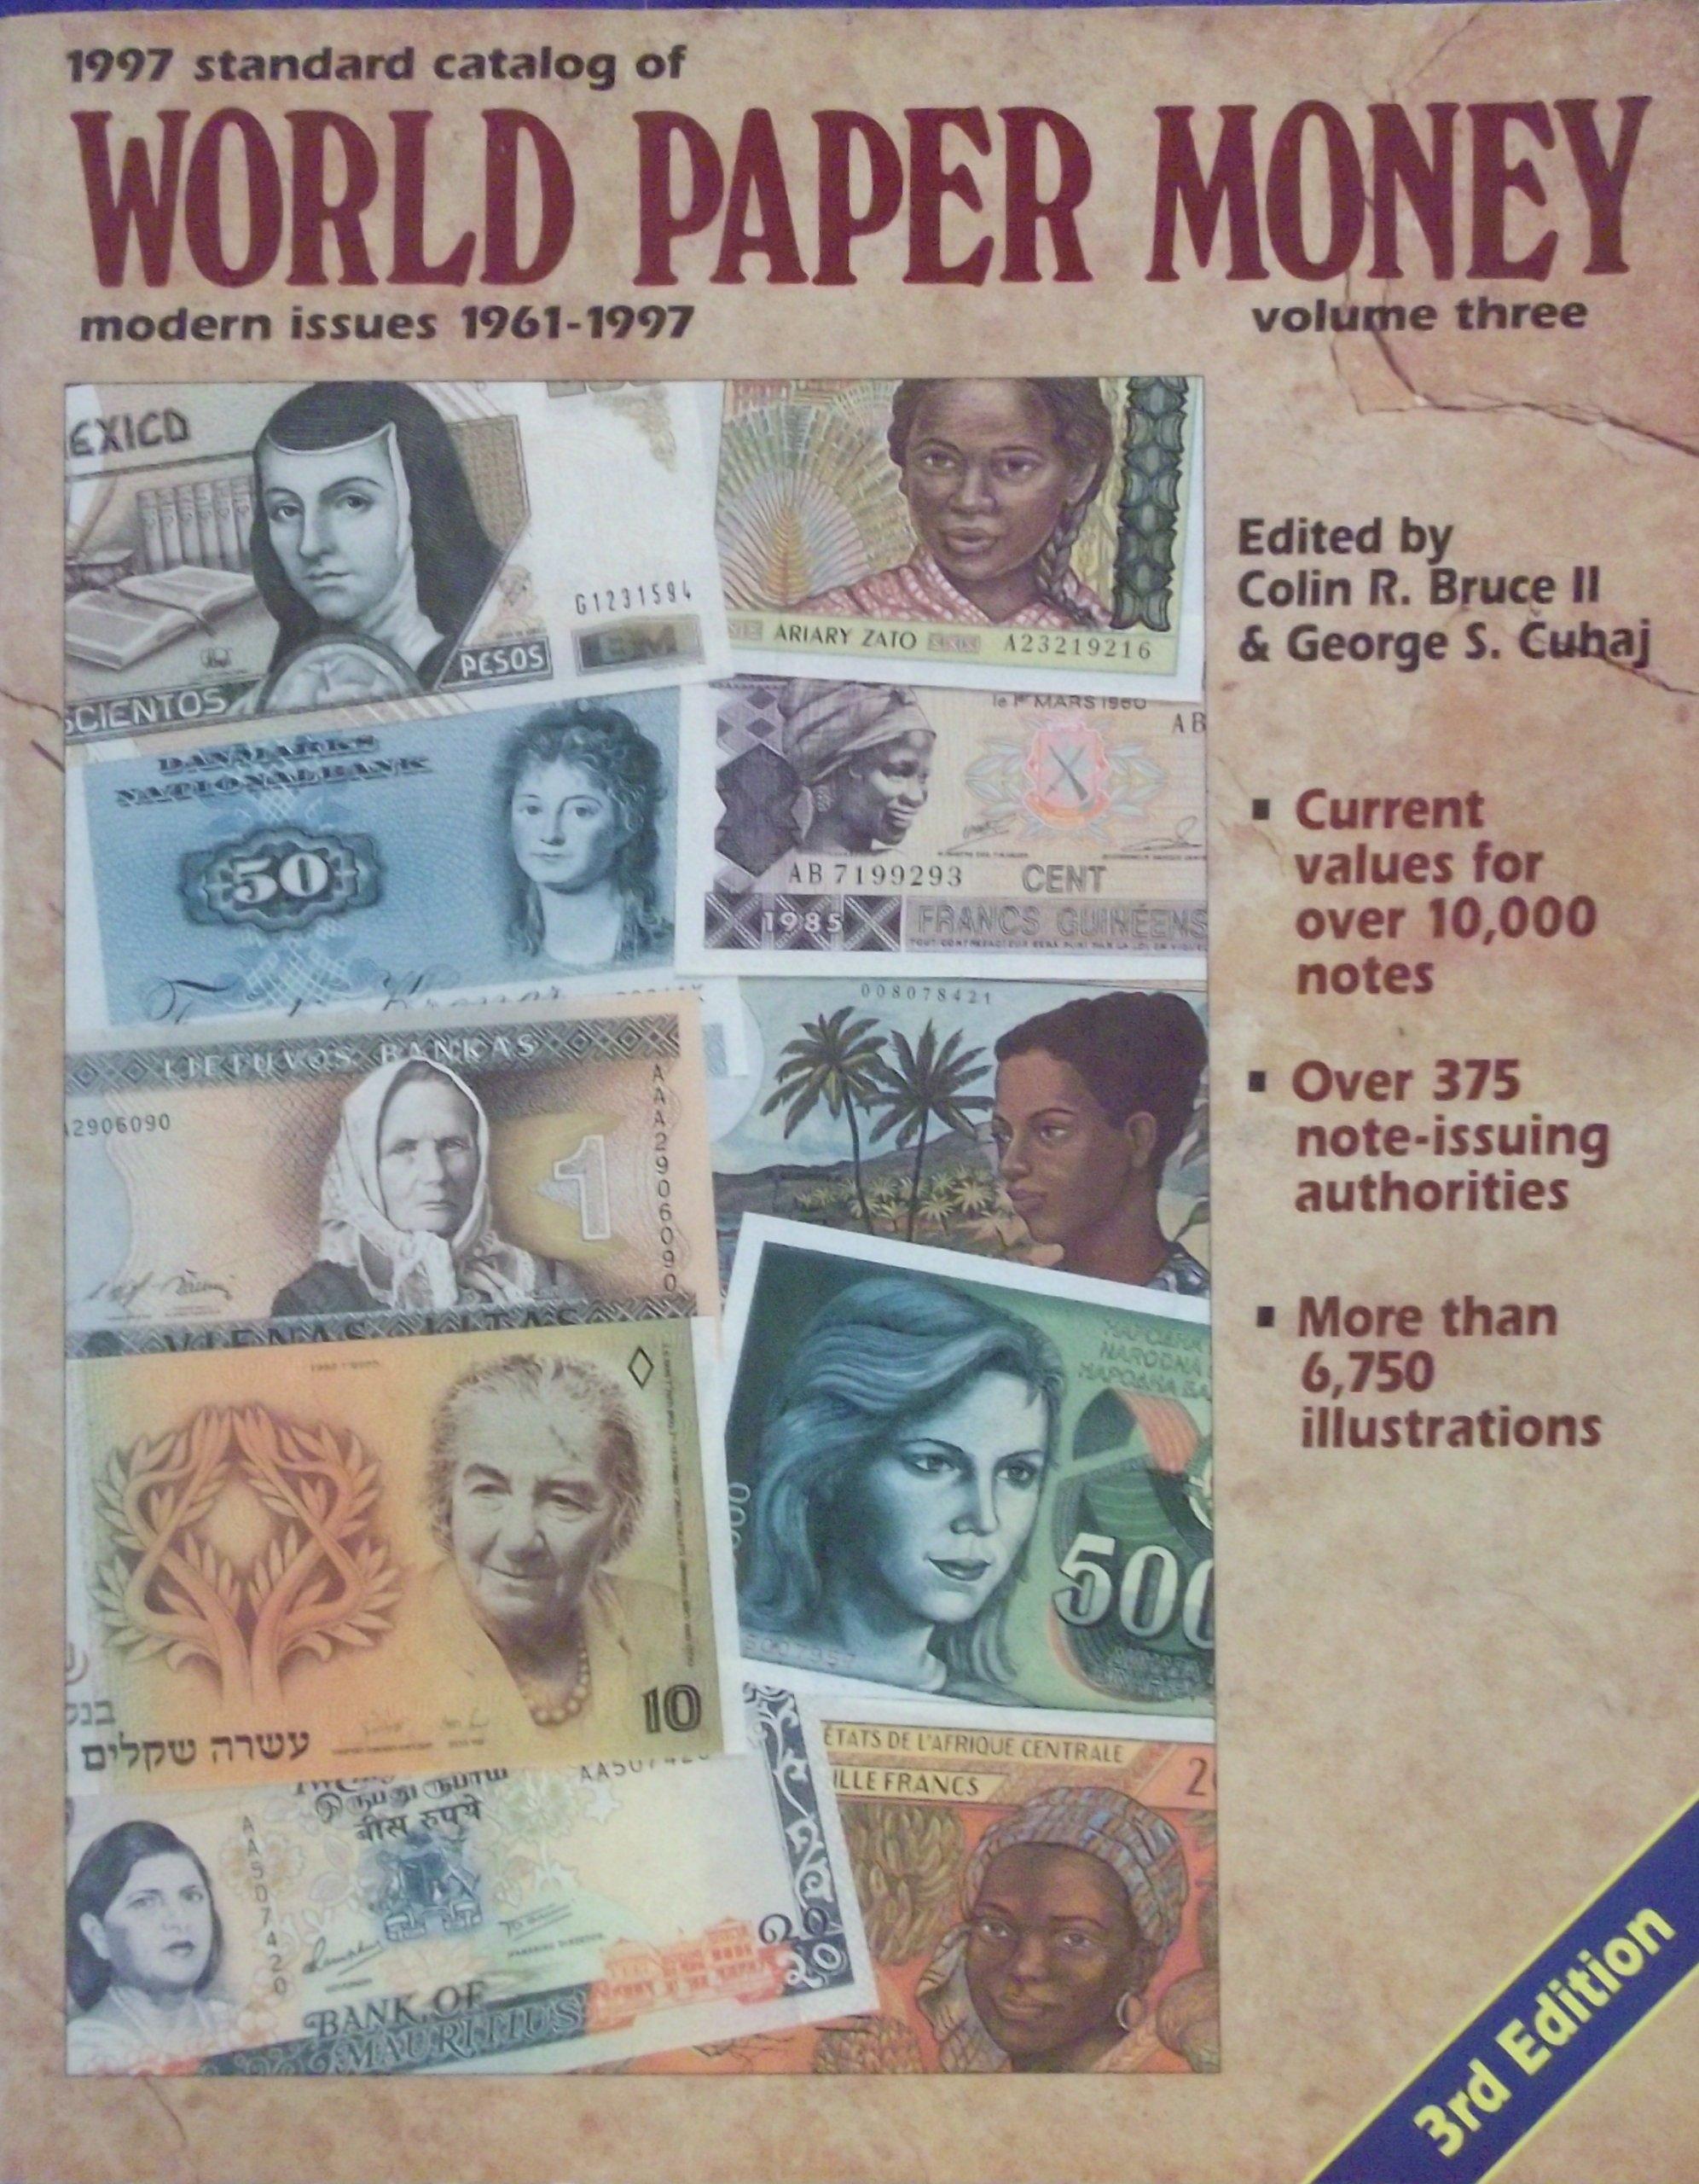 Standard Catalog of World Paper Money: Modern Issues : 1961-1997 (STANDARD CATALOG OF WORLD PAPER MONEY VOL 3: MODERN ISSUES)